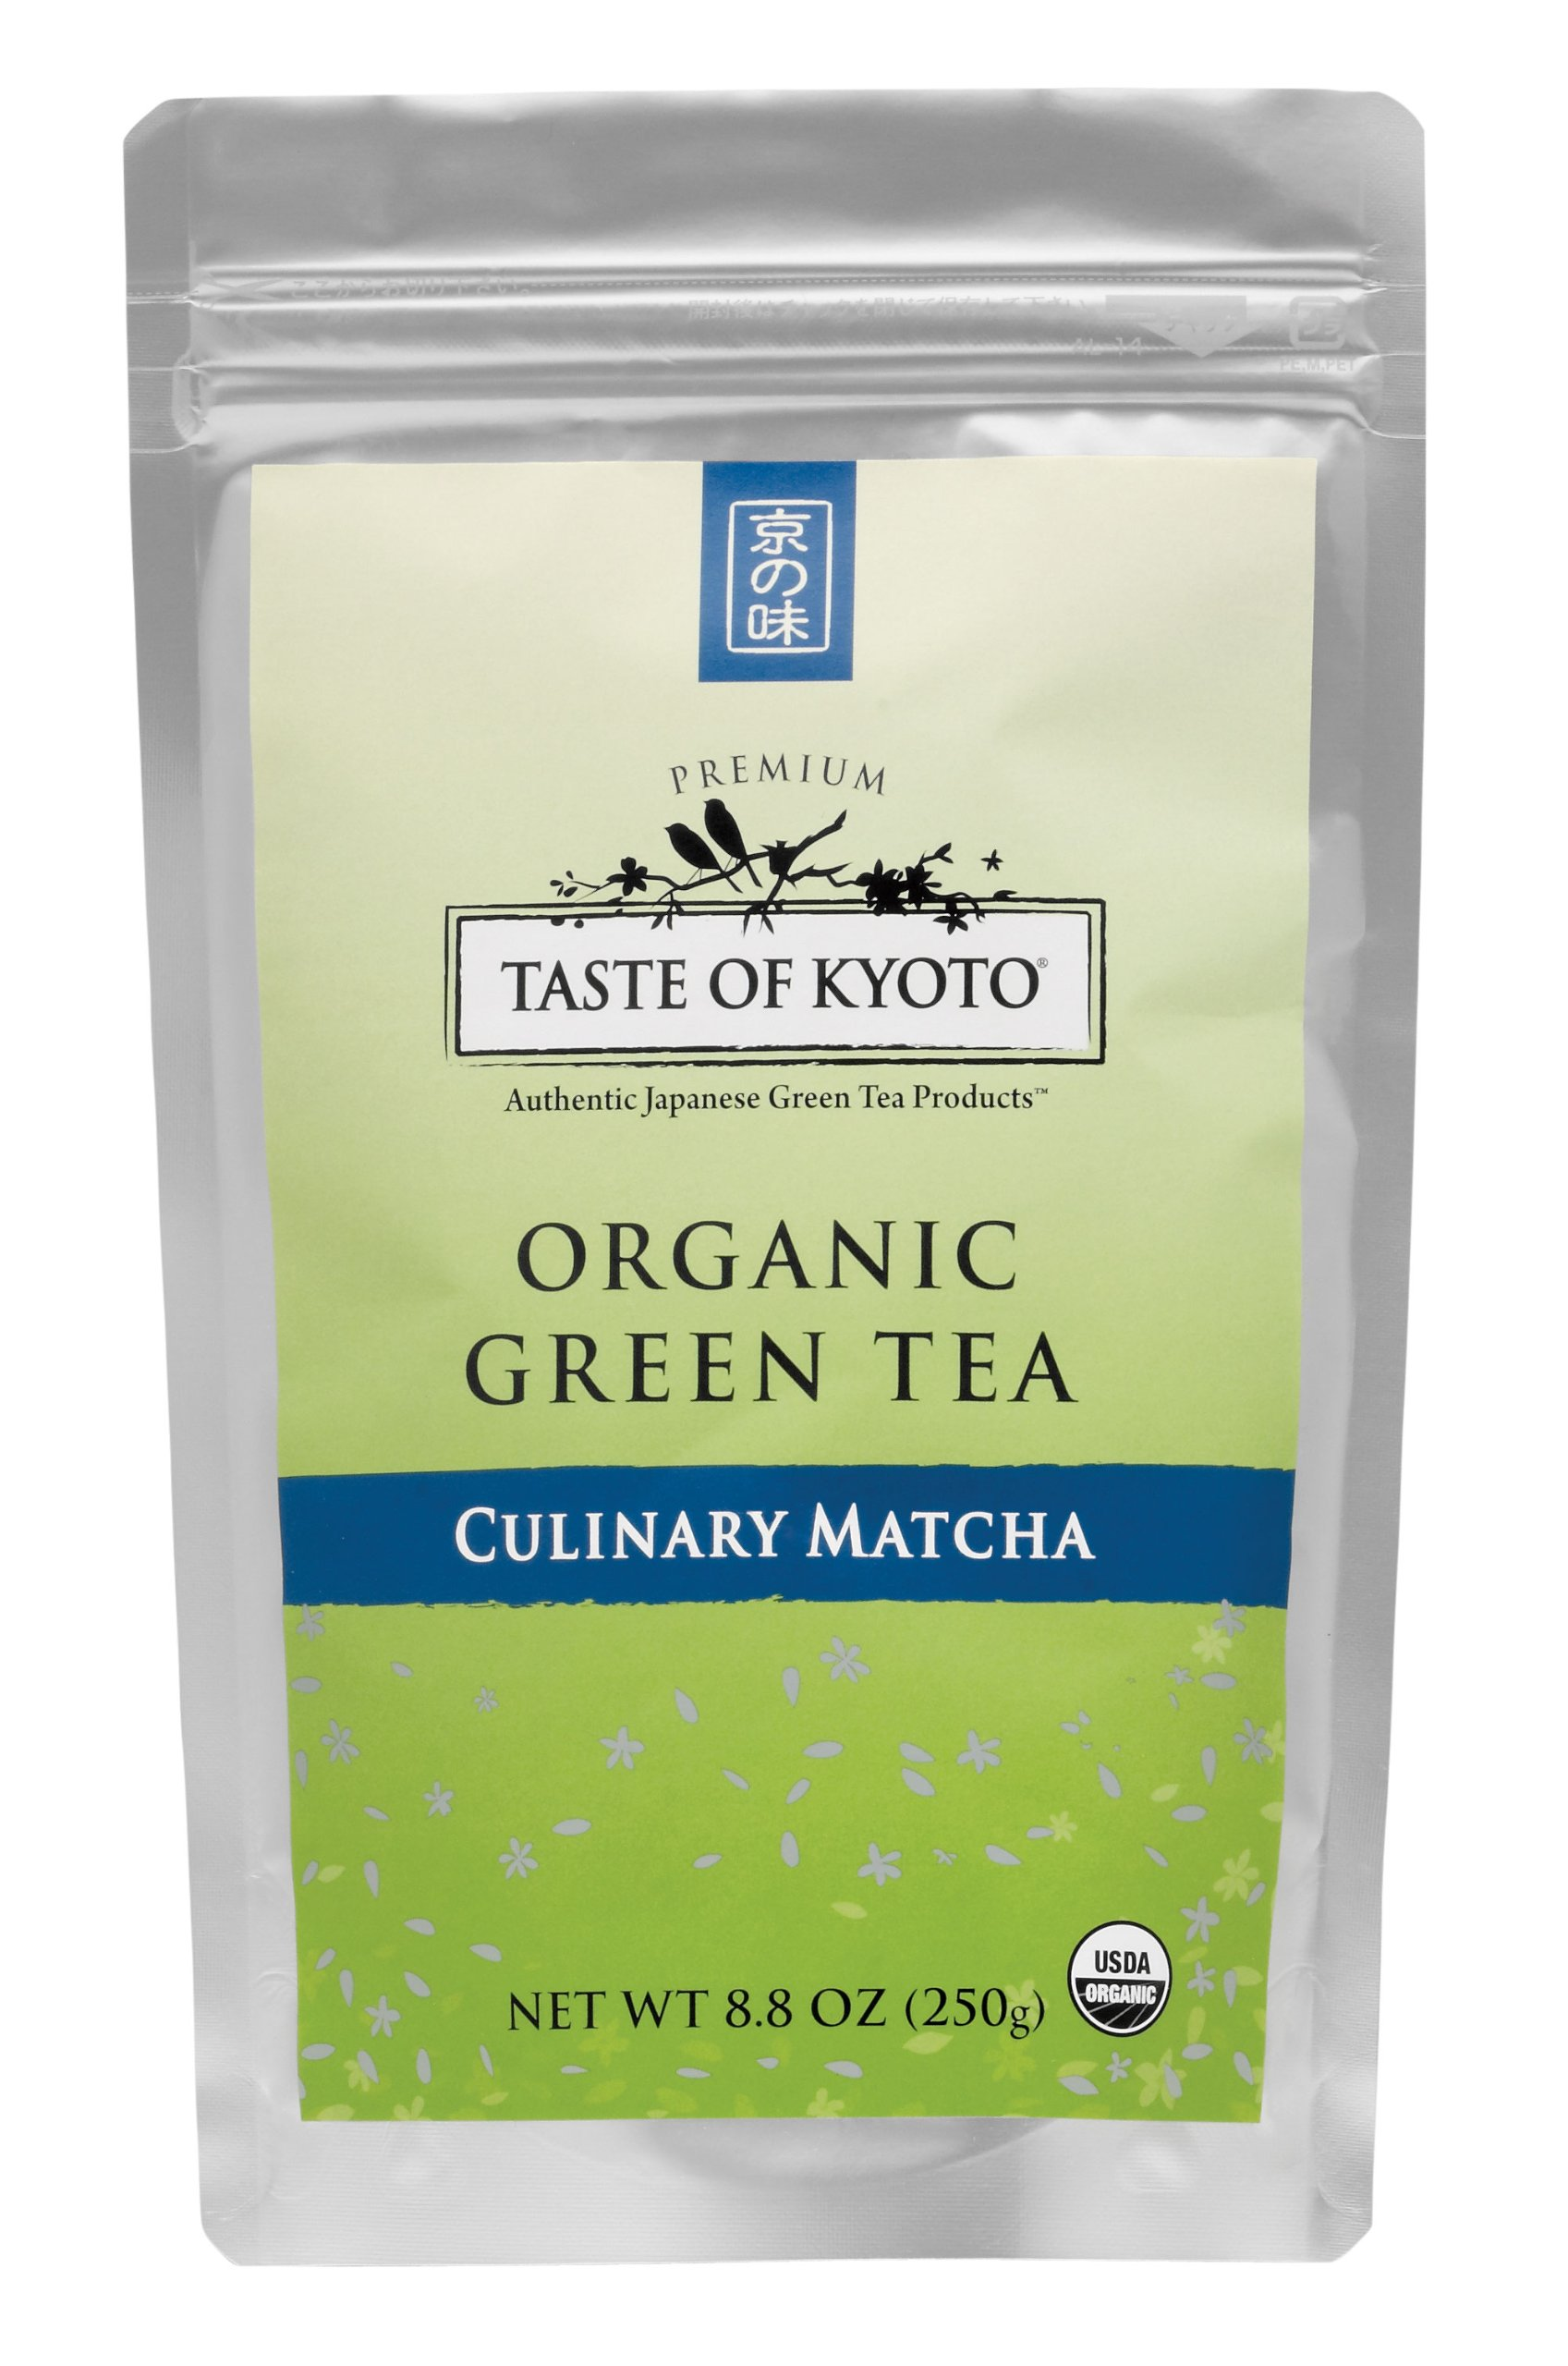 TASTE OF KYOTO Matcha Green Tea, Bulk Culinary, 8.80 Ounce by Taste of Kyoto